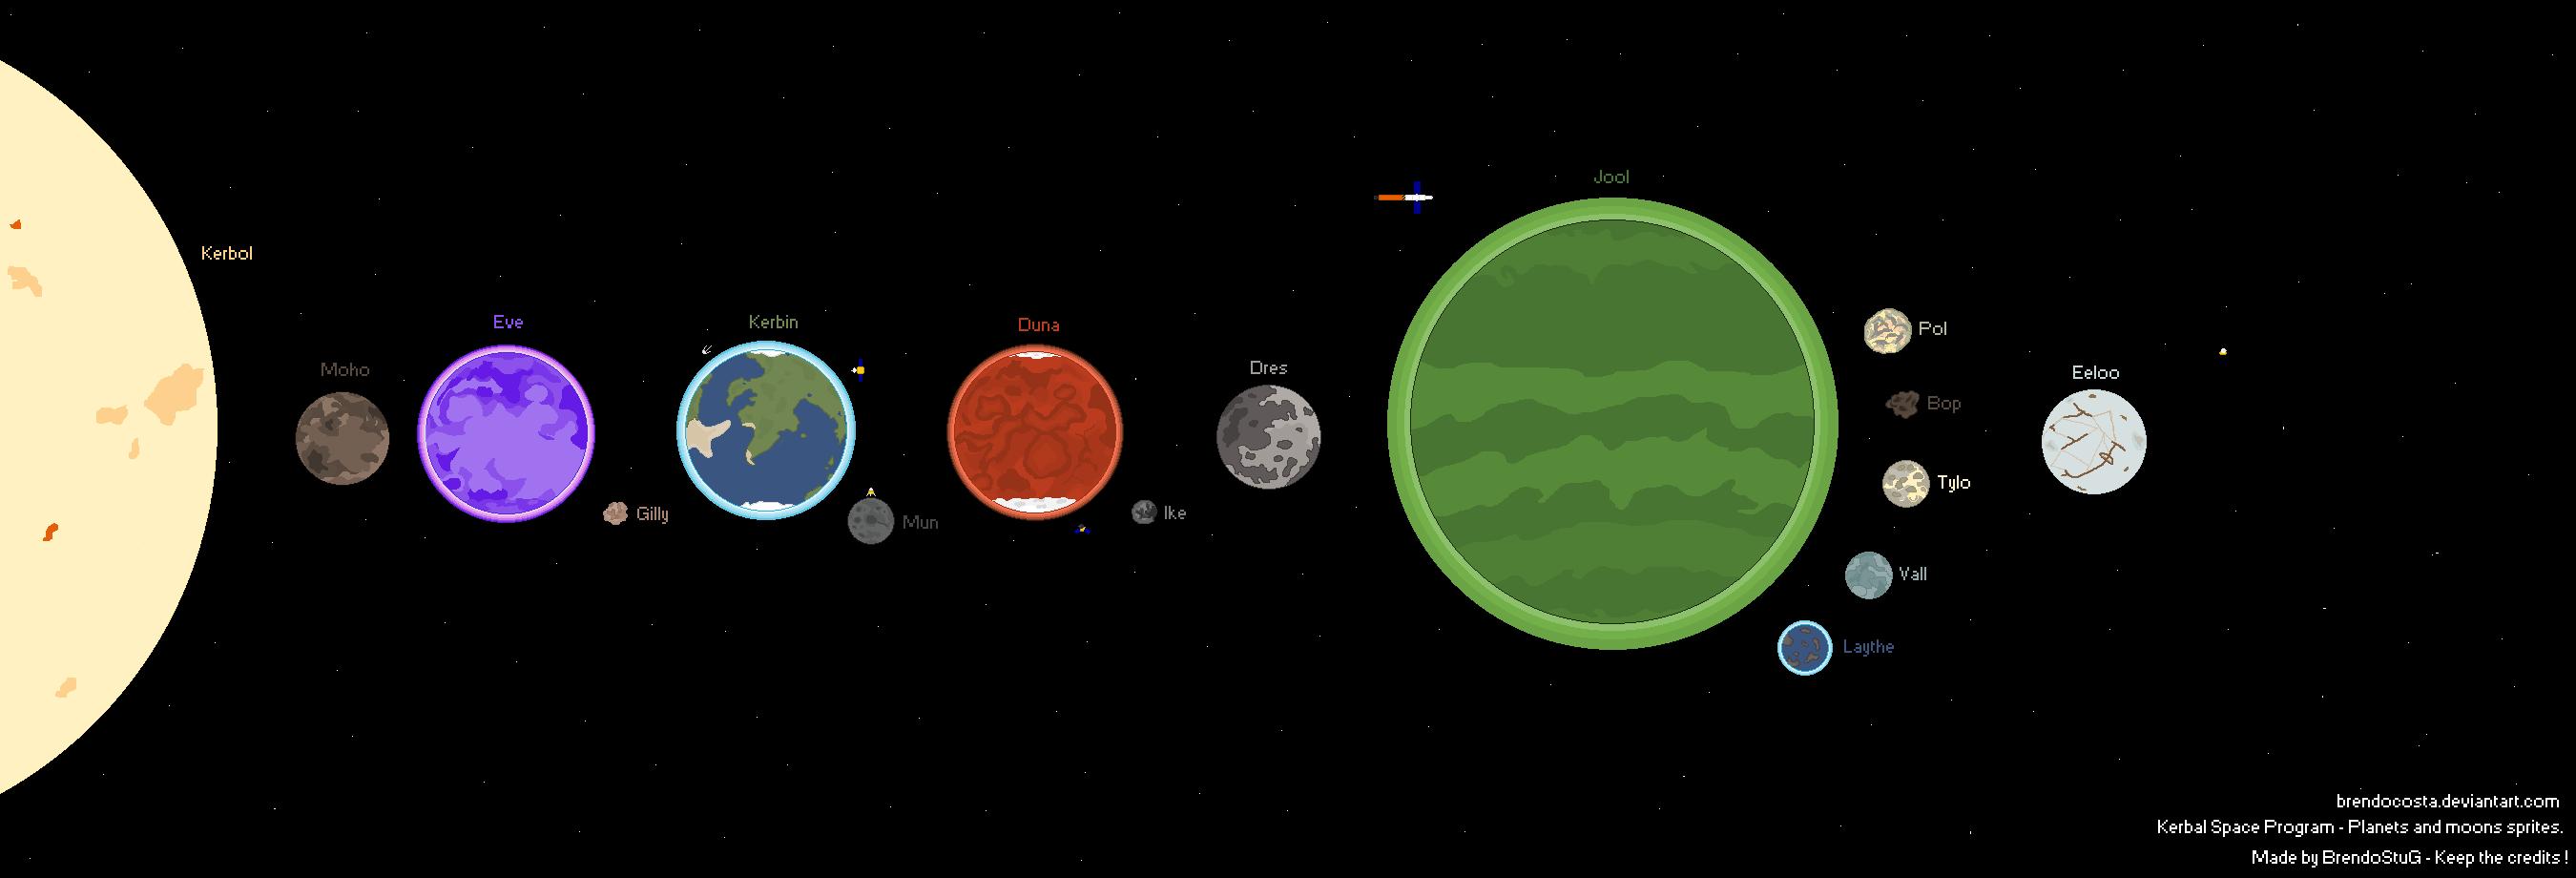 ksp_planet_sprites_by_brendostug_by_bren